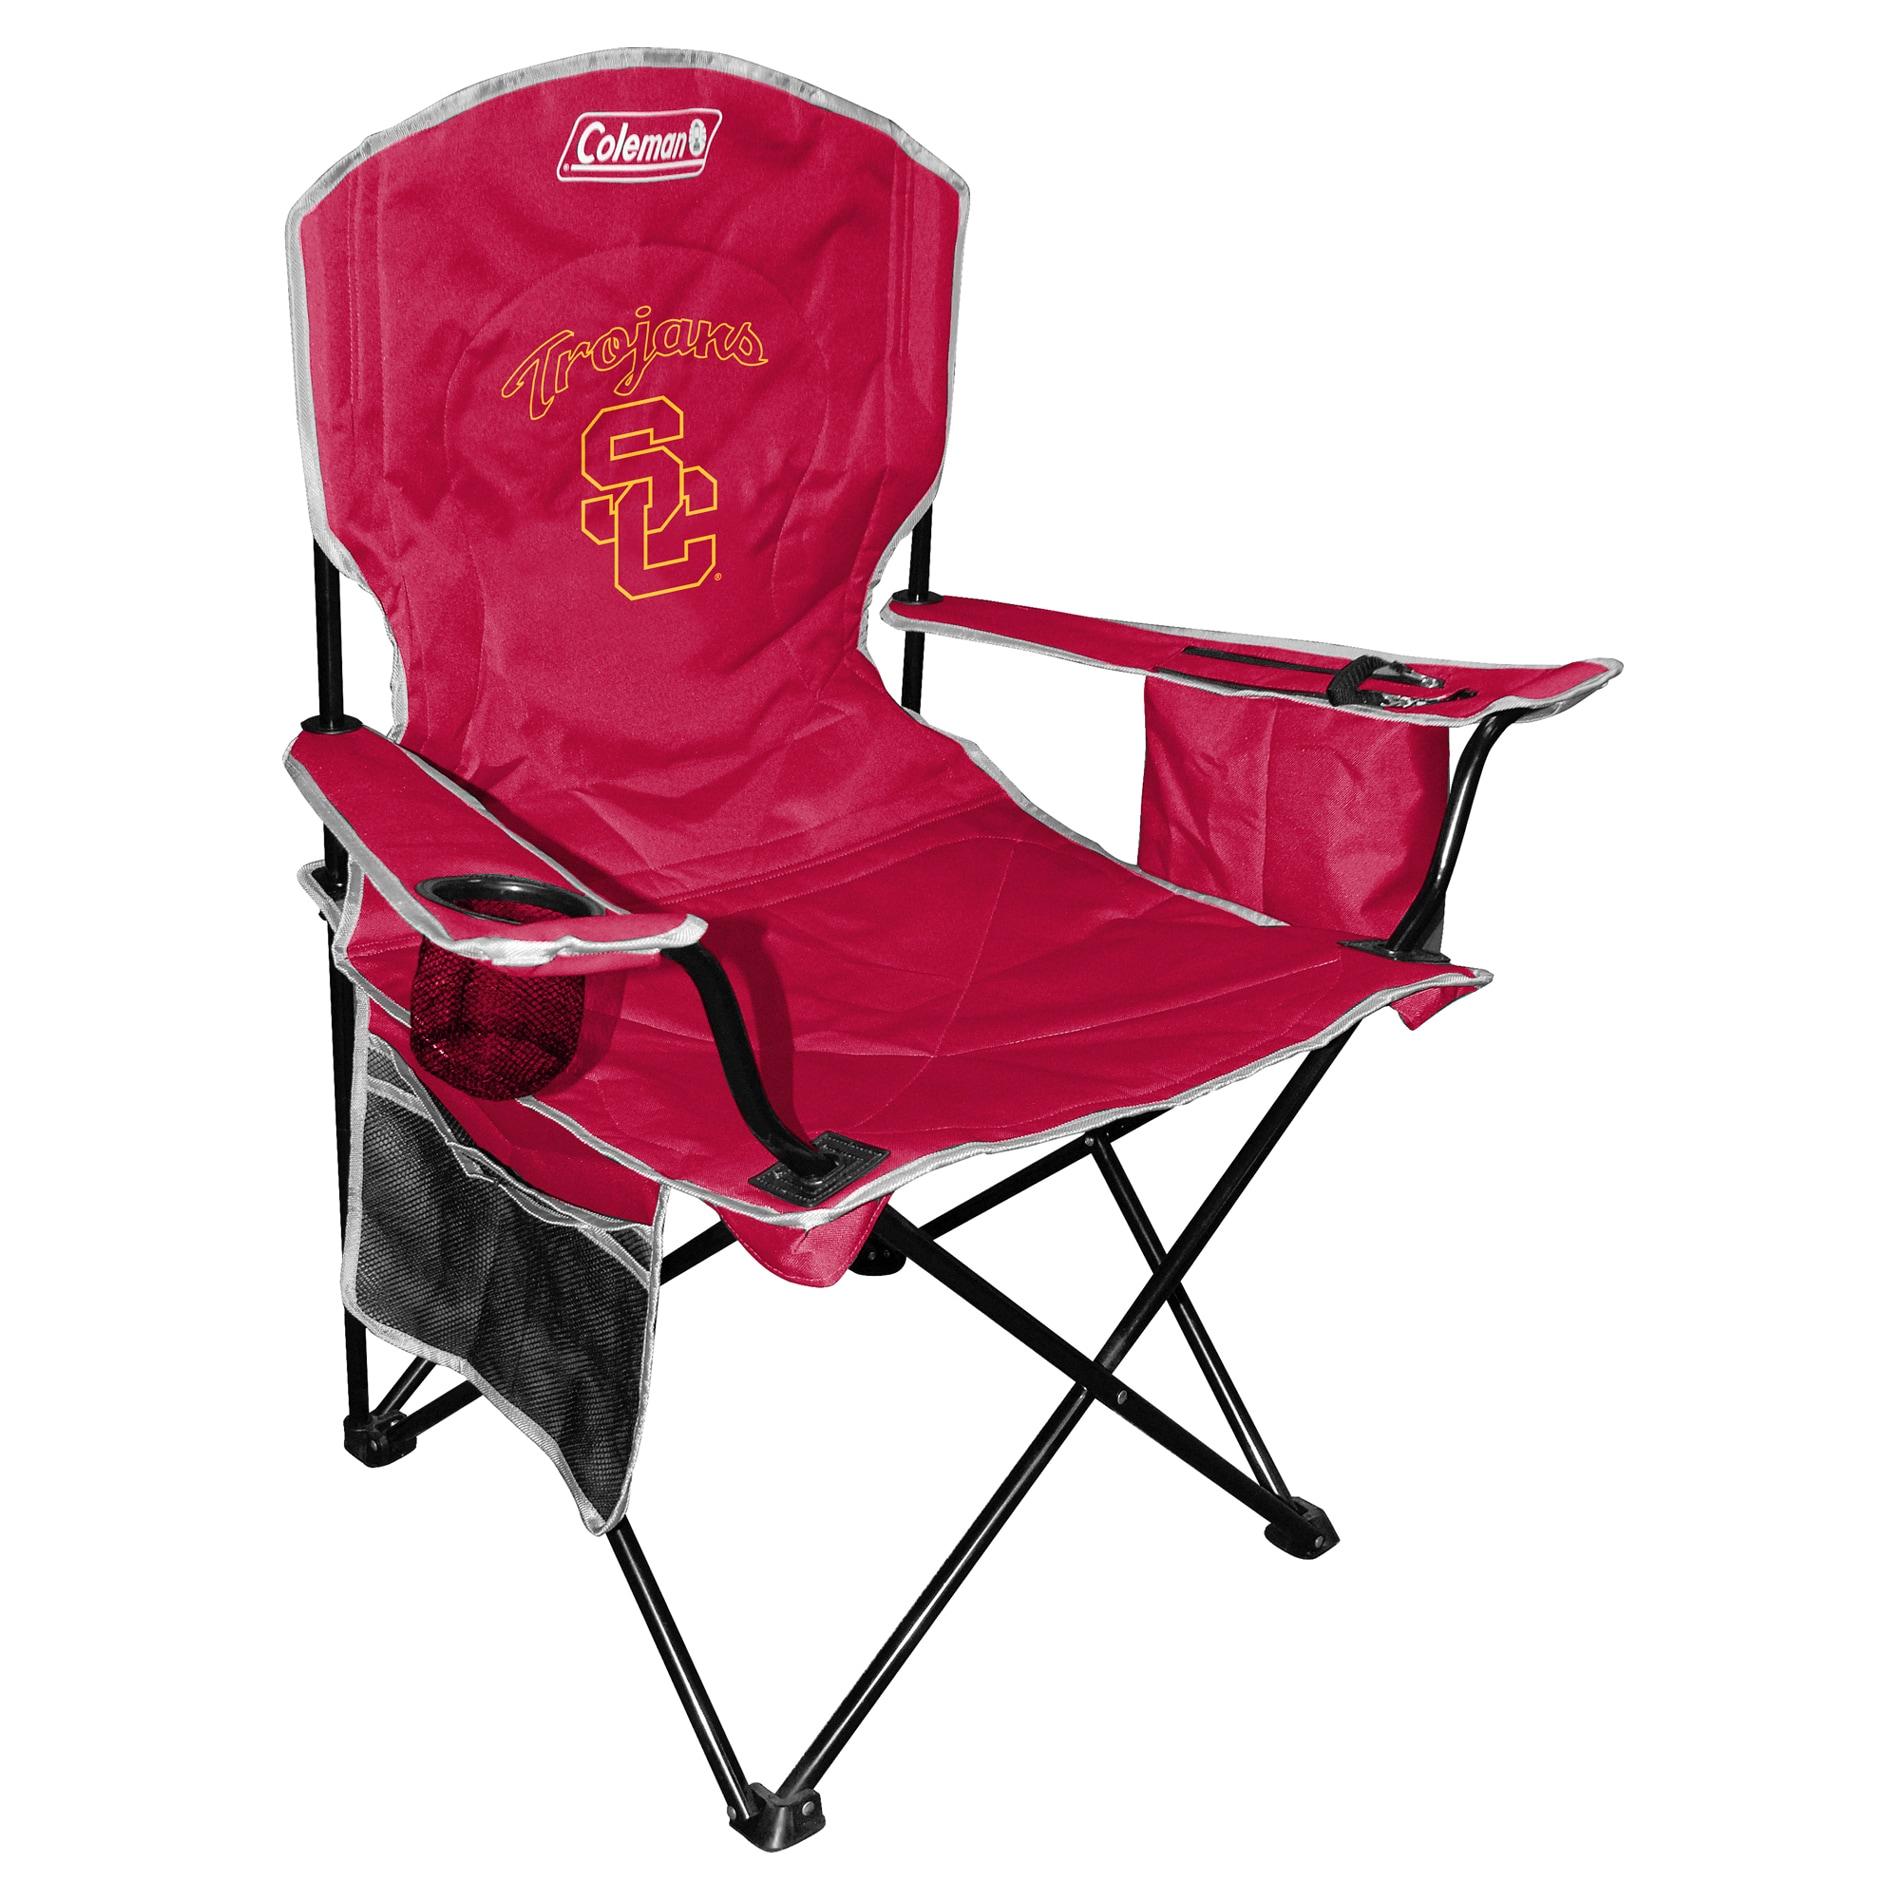 Coleman NCAA USC Trojans XL Cooler Quad Chair at Sears.com